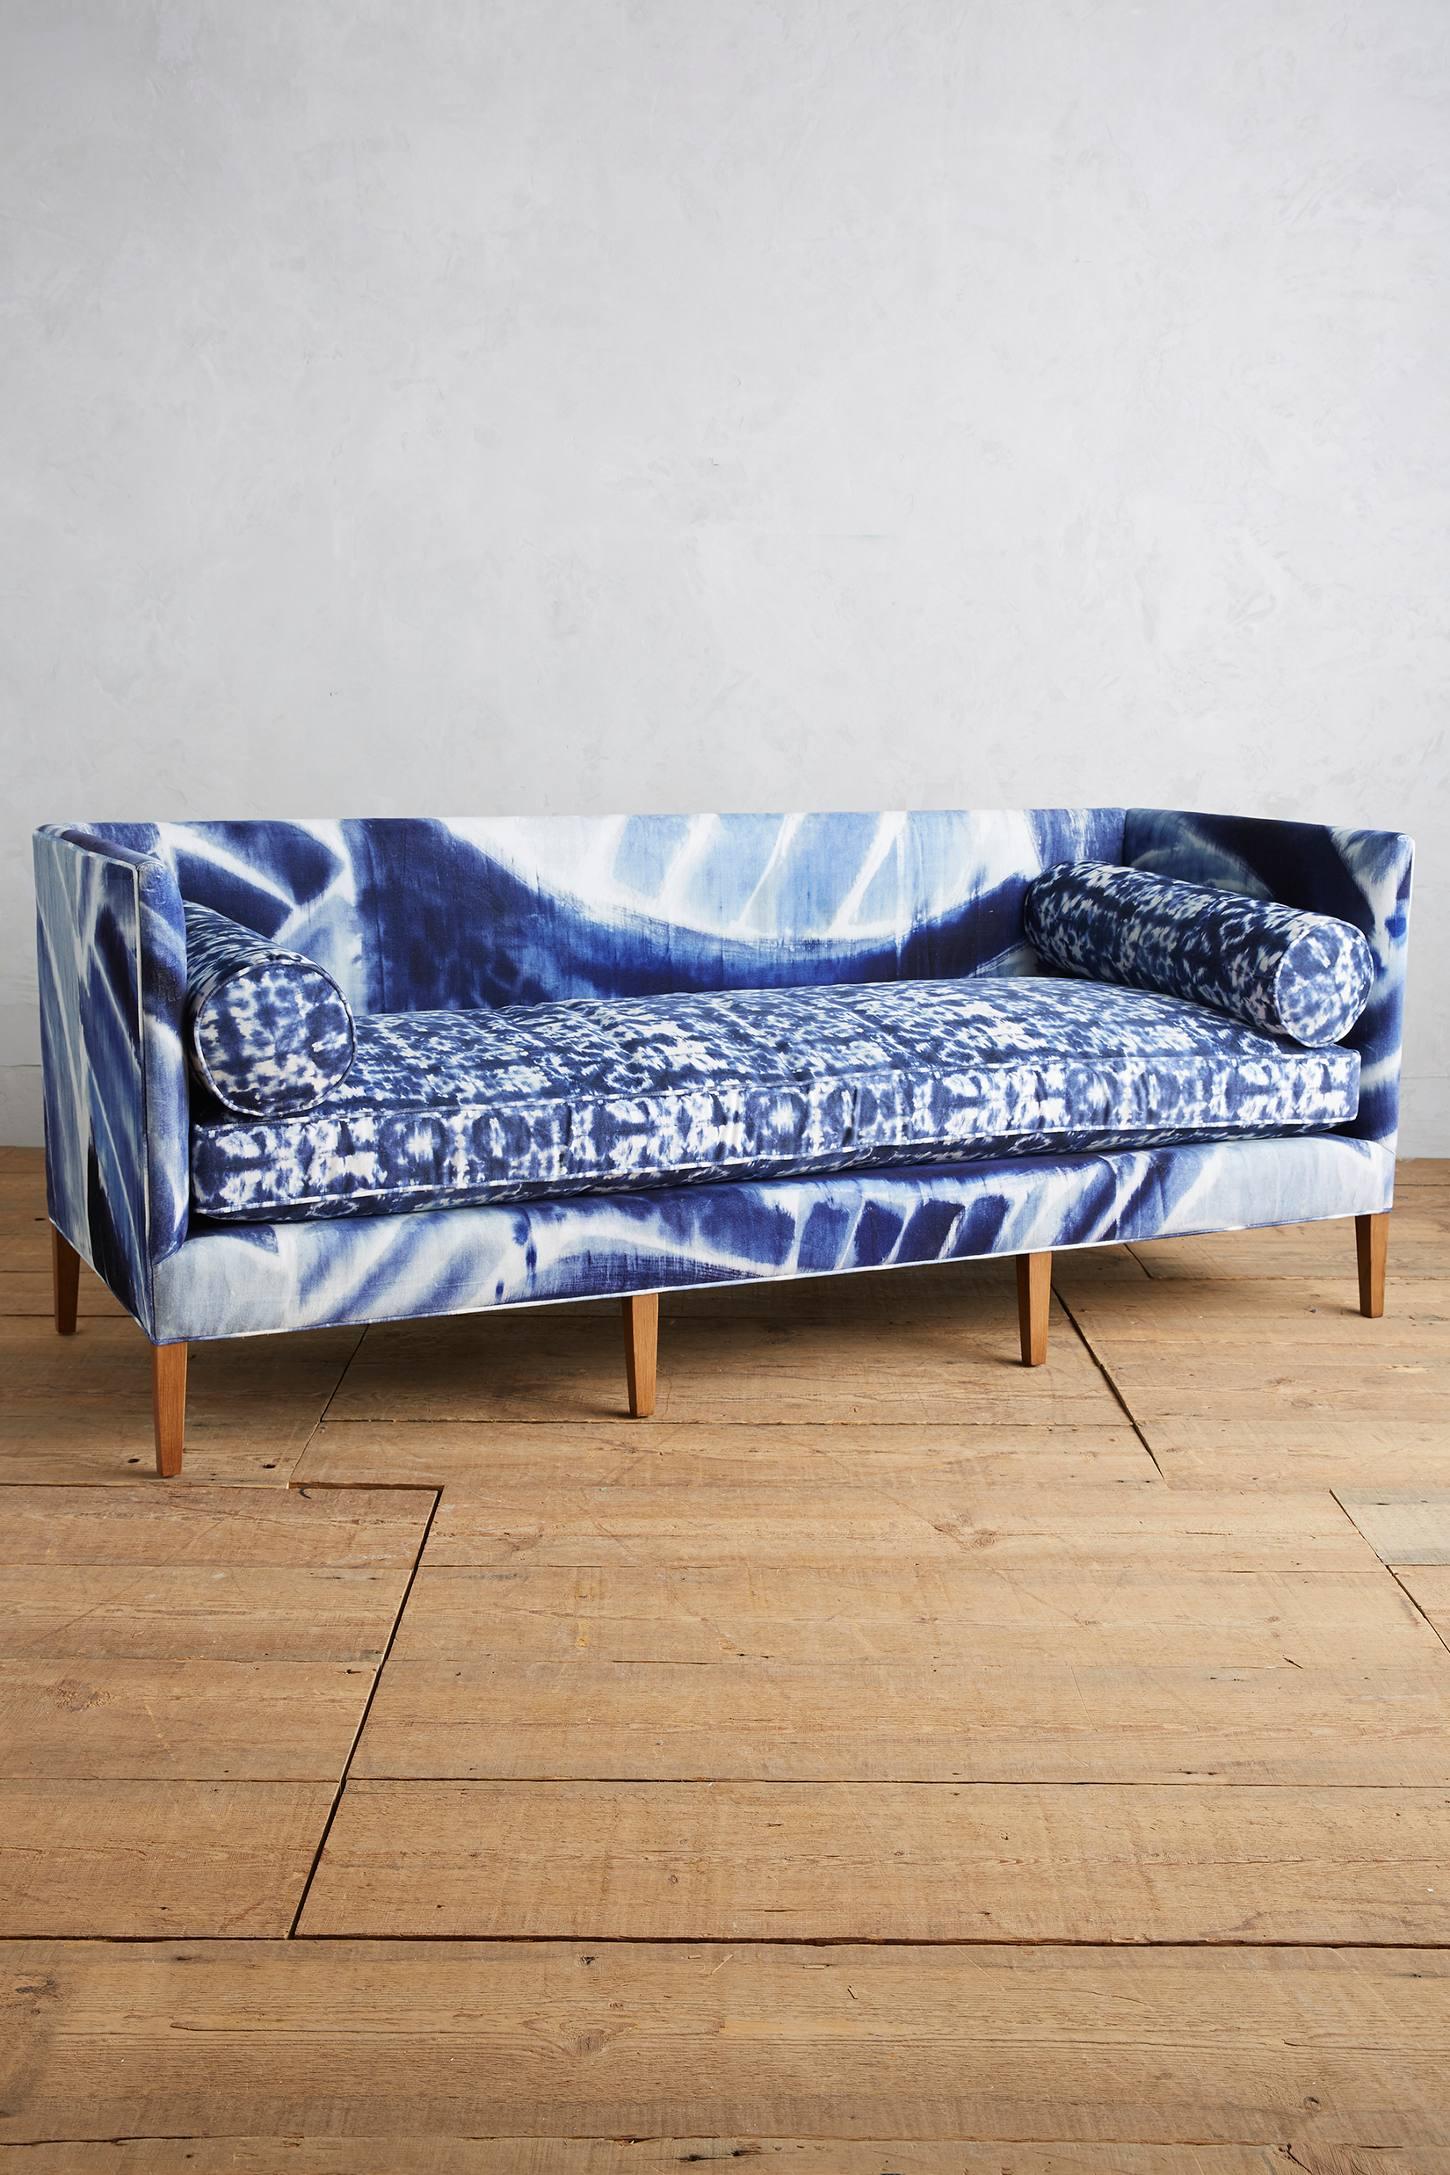 Shibori-inspired sofa from Anthropologie